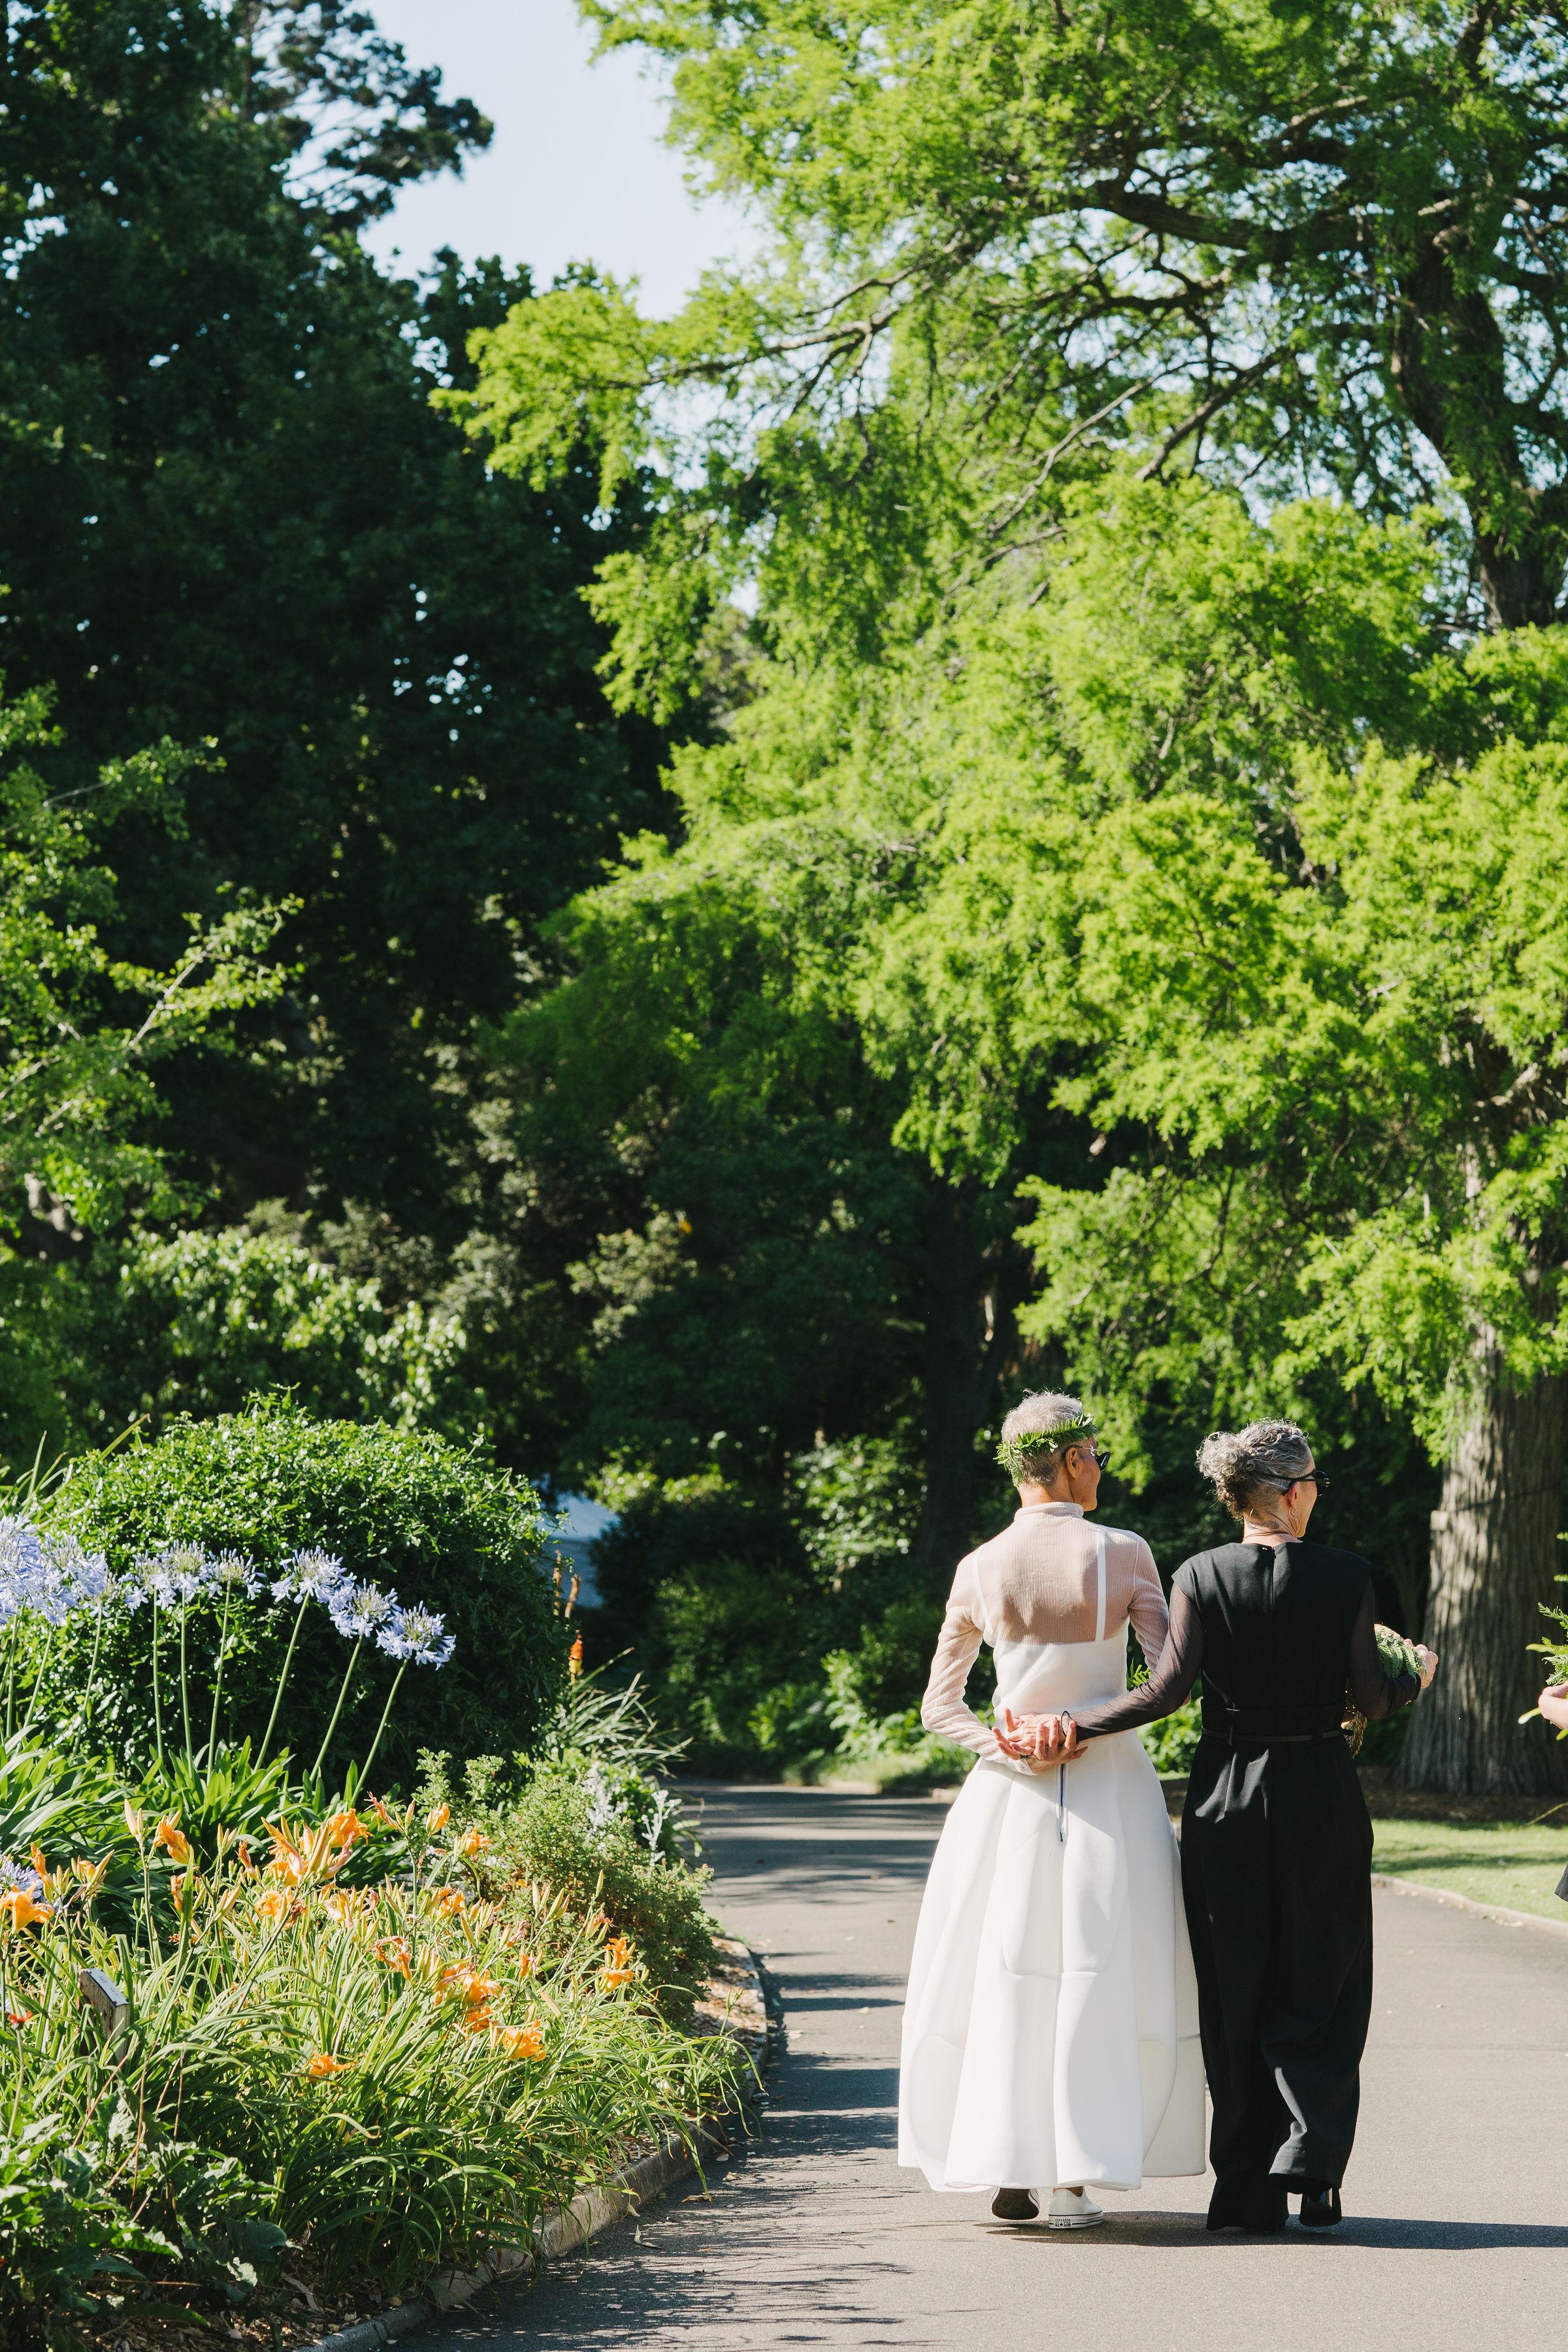 Brides walking through The Royal Botanic Garden Sydney for their wedding